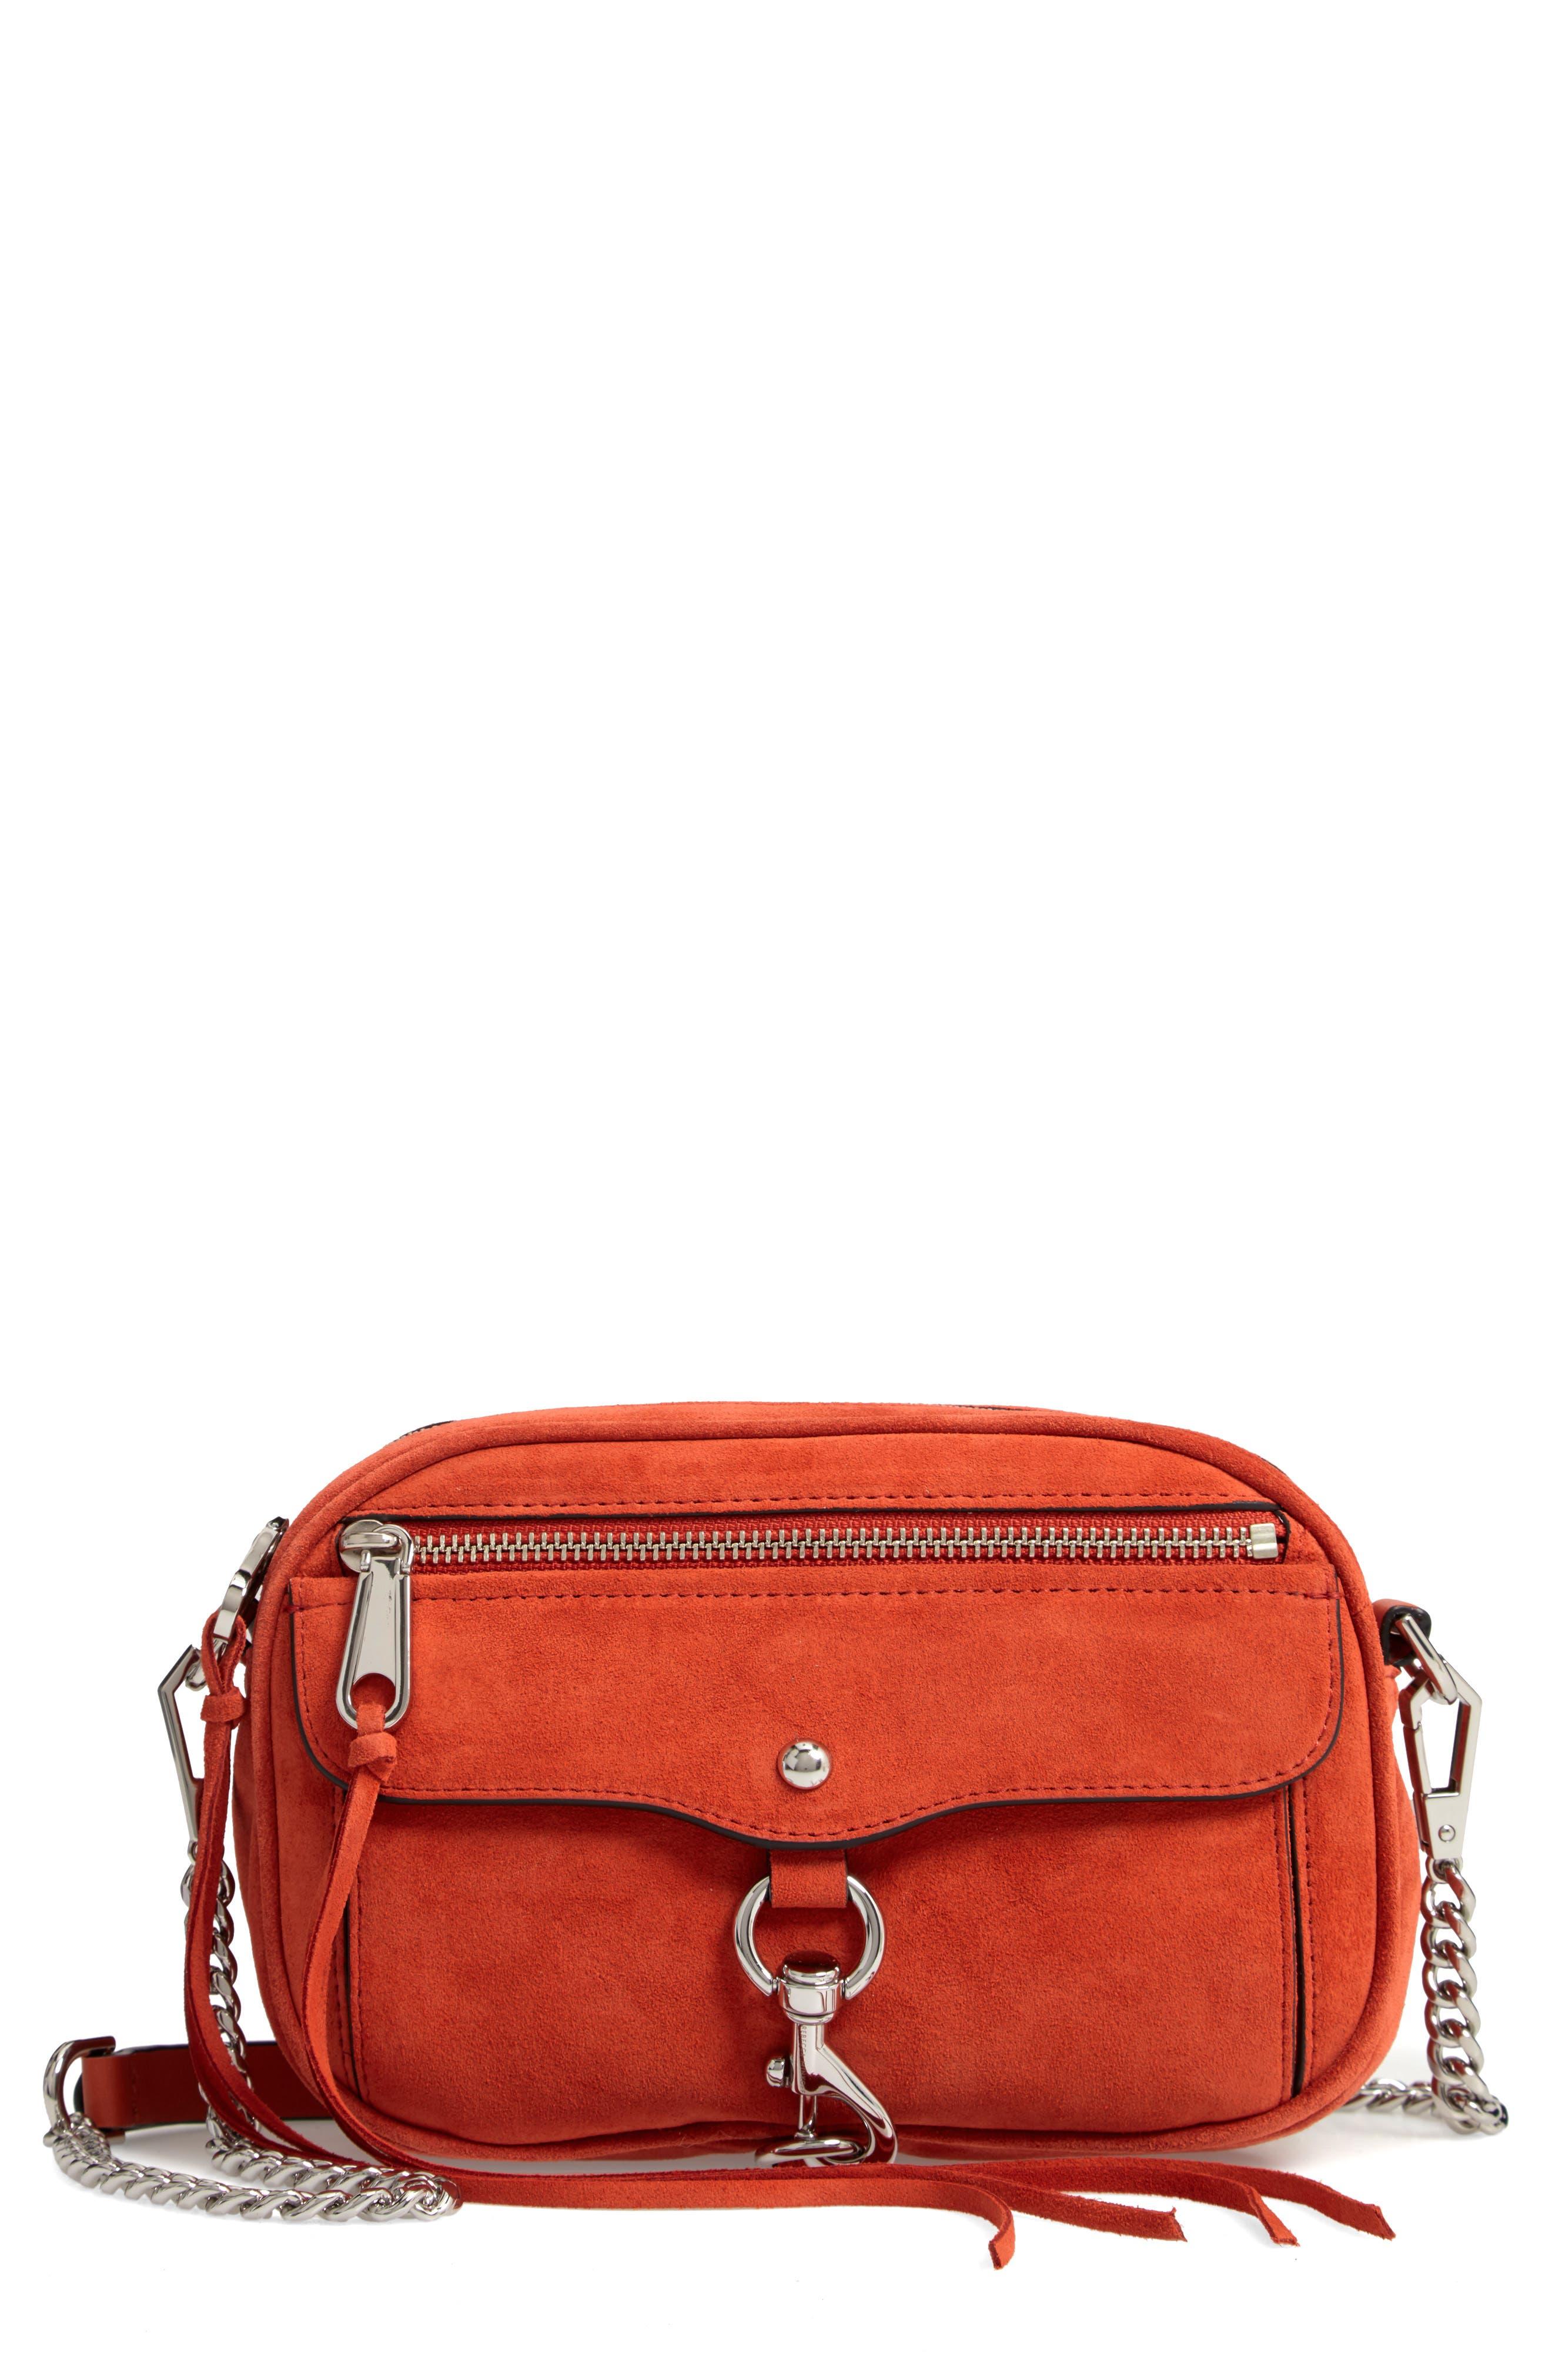 REBECCA MINKOFF Blythe Suede Crossbody Bag, Main, color, RUST